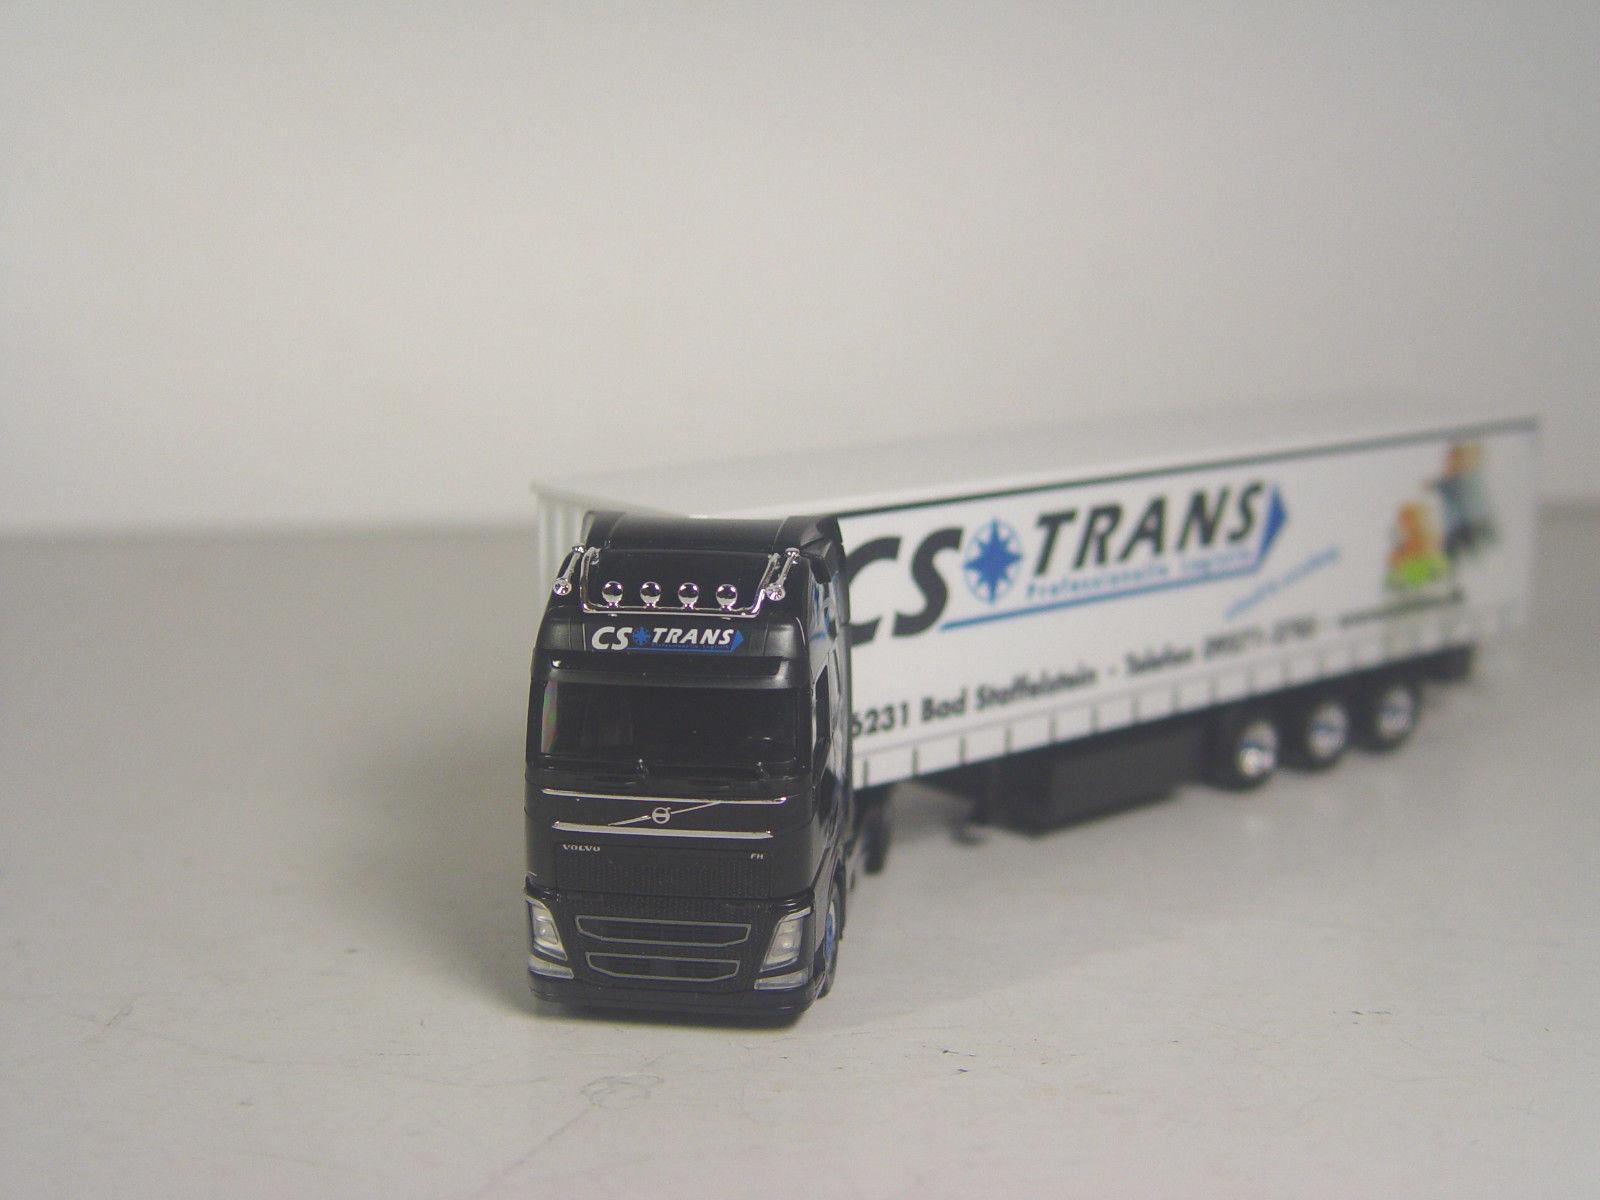 Viola Trans NEU OVP herpa 922685 Volvo FH GL XL Lebensmitteltank-Sattelzug